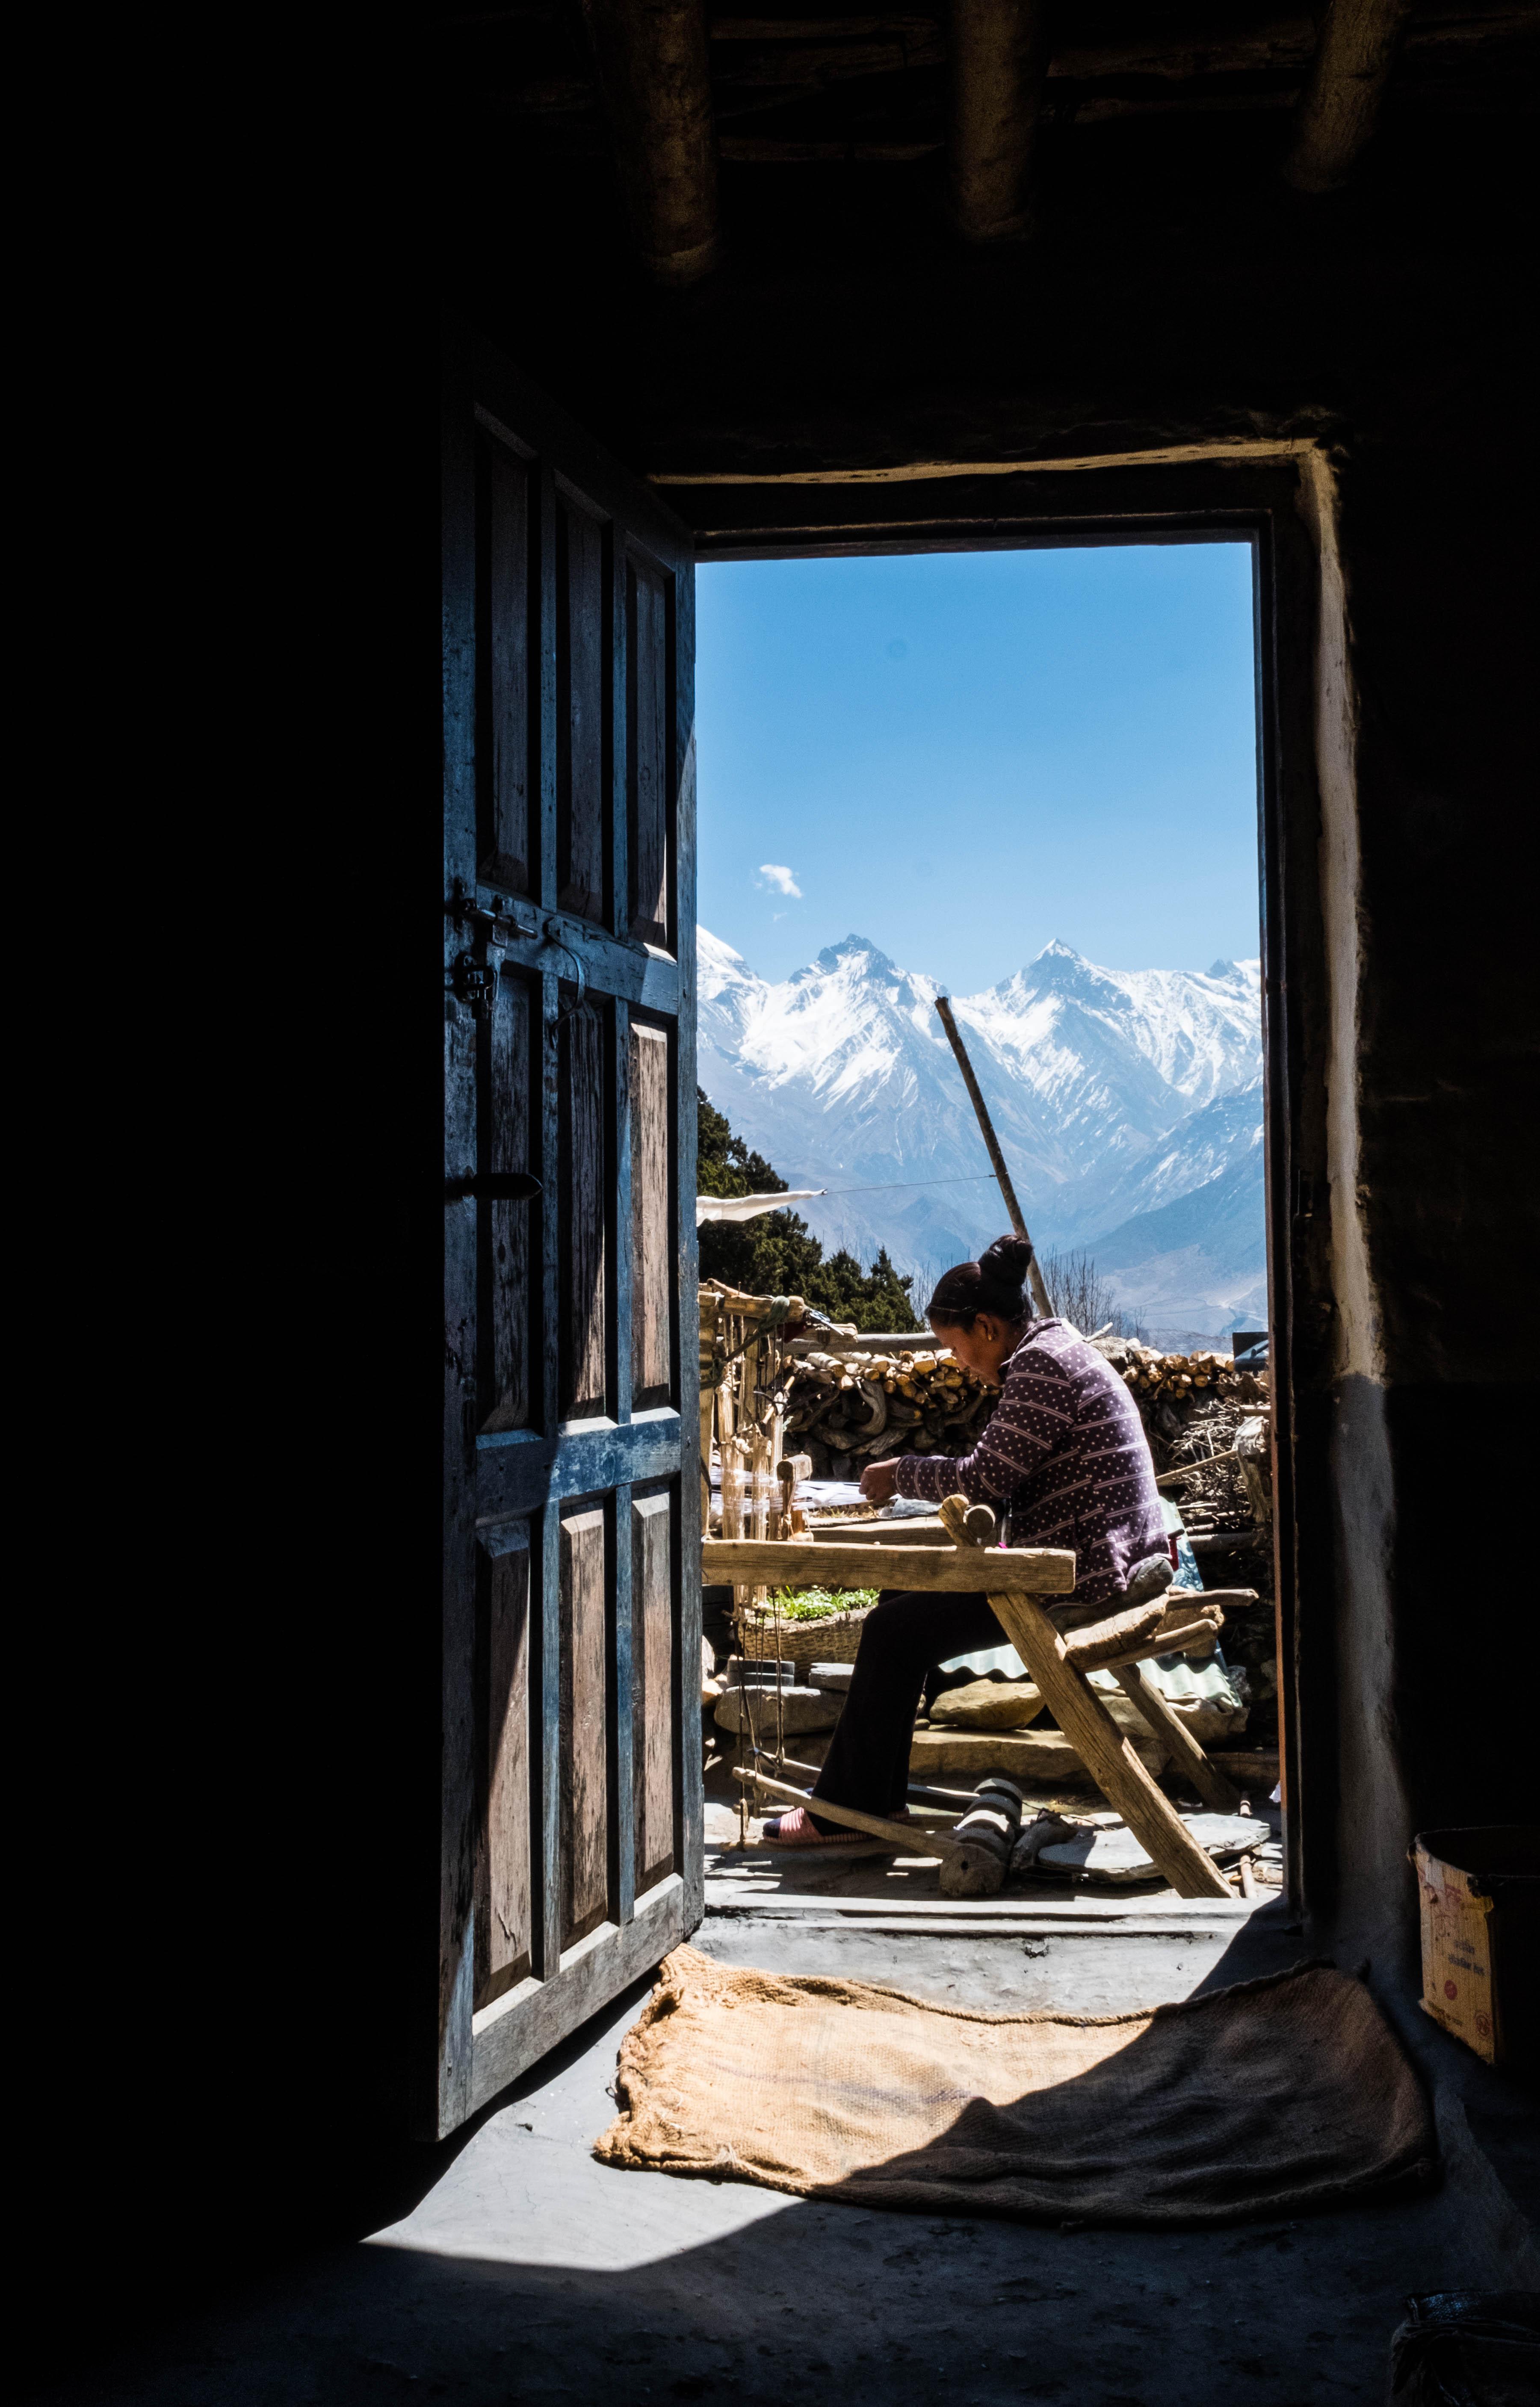 Himalaya in the Backyard